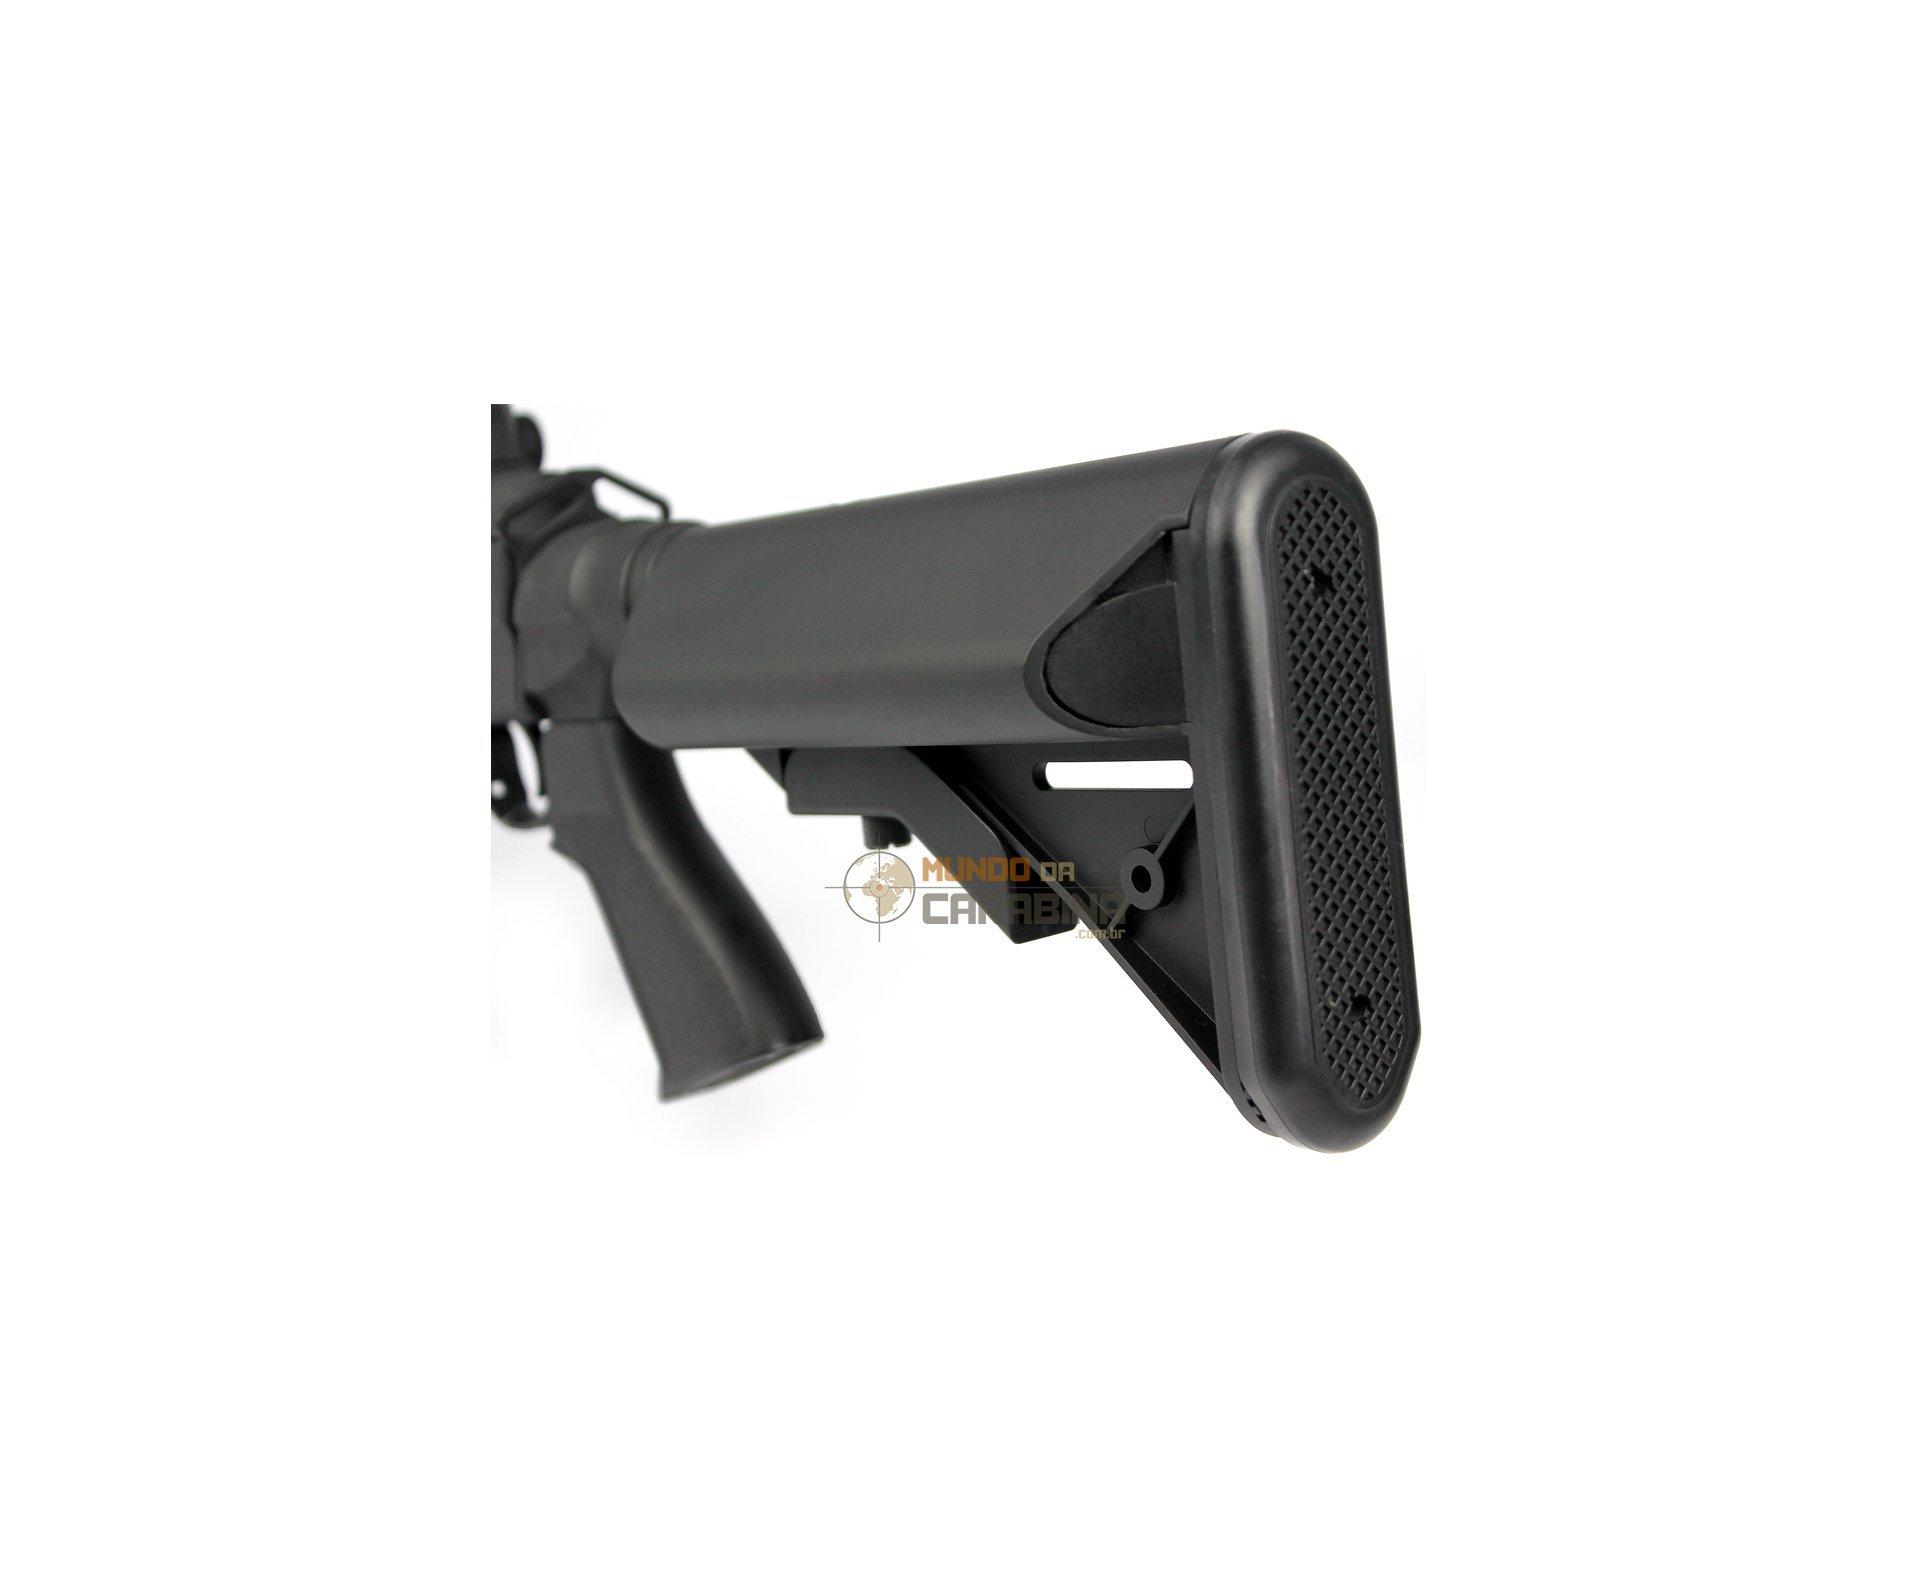 Rifle De Airsoft M14 Ebr Full Metal Aeg Cal 6,0mm -cyma